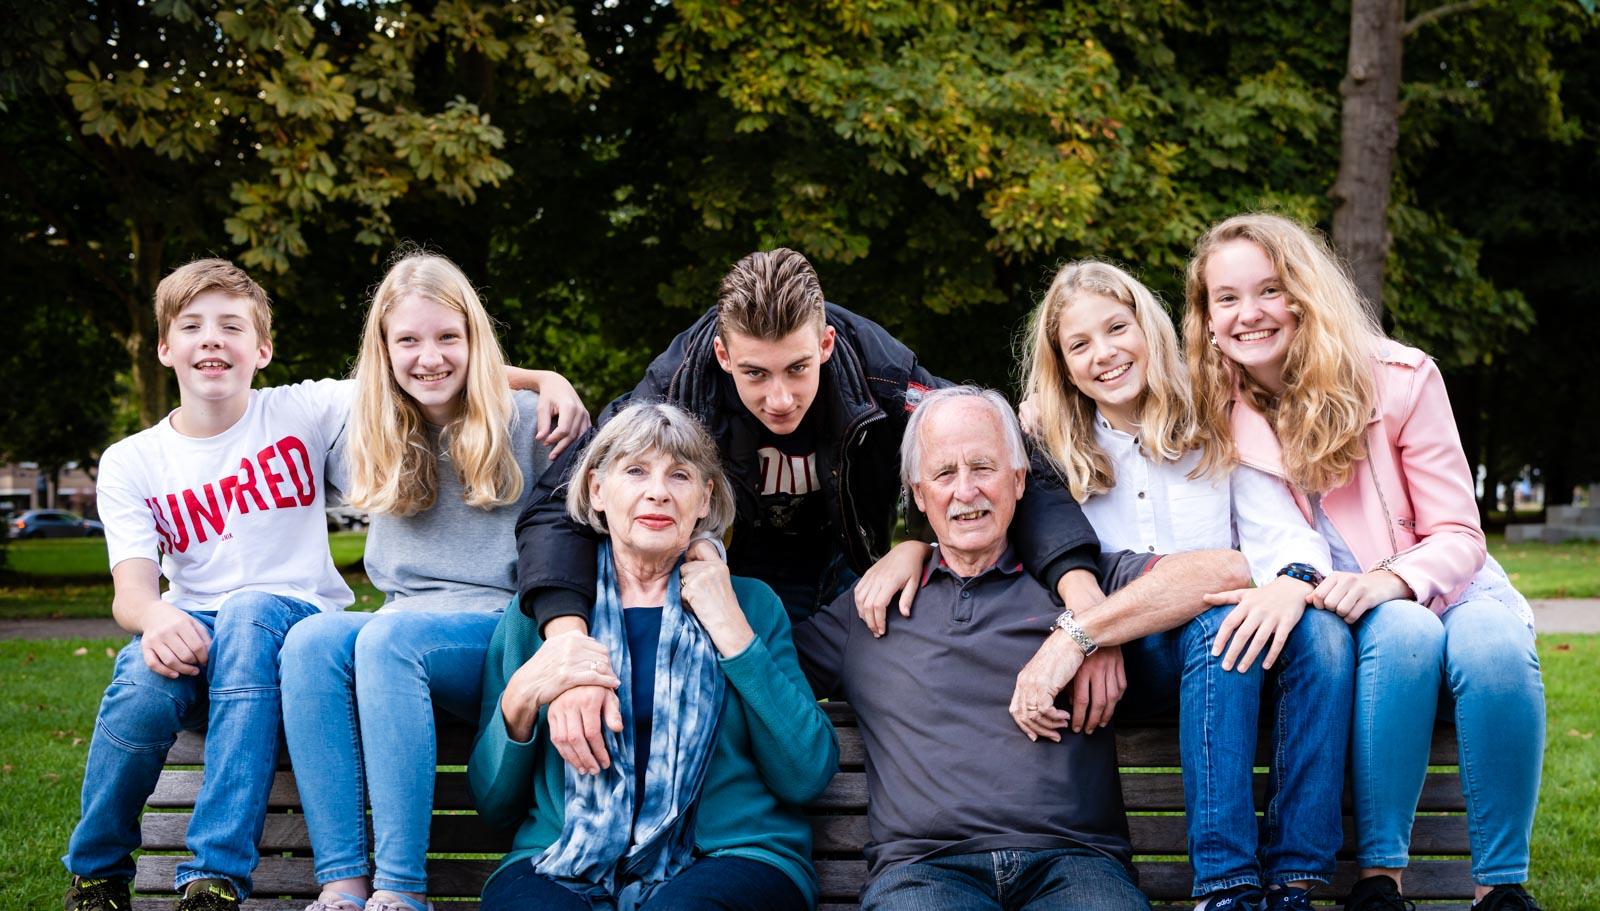 Fotograaf Zalmiy Paeez Gezinsfotografie, familieportret, familie fotografie, gezinsfotograaf Haarlem Heemstede Noord-Holland